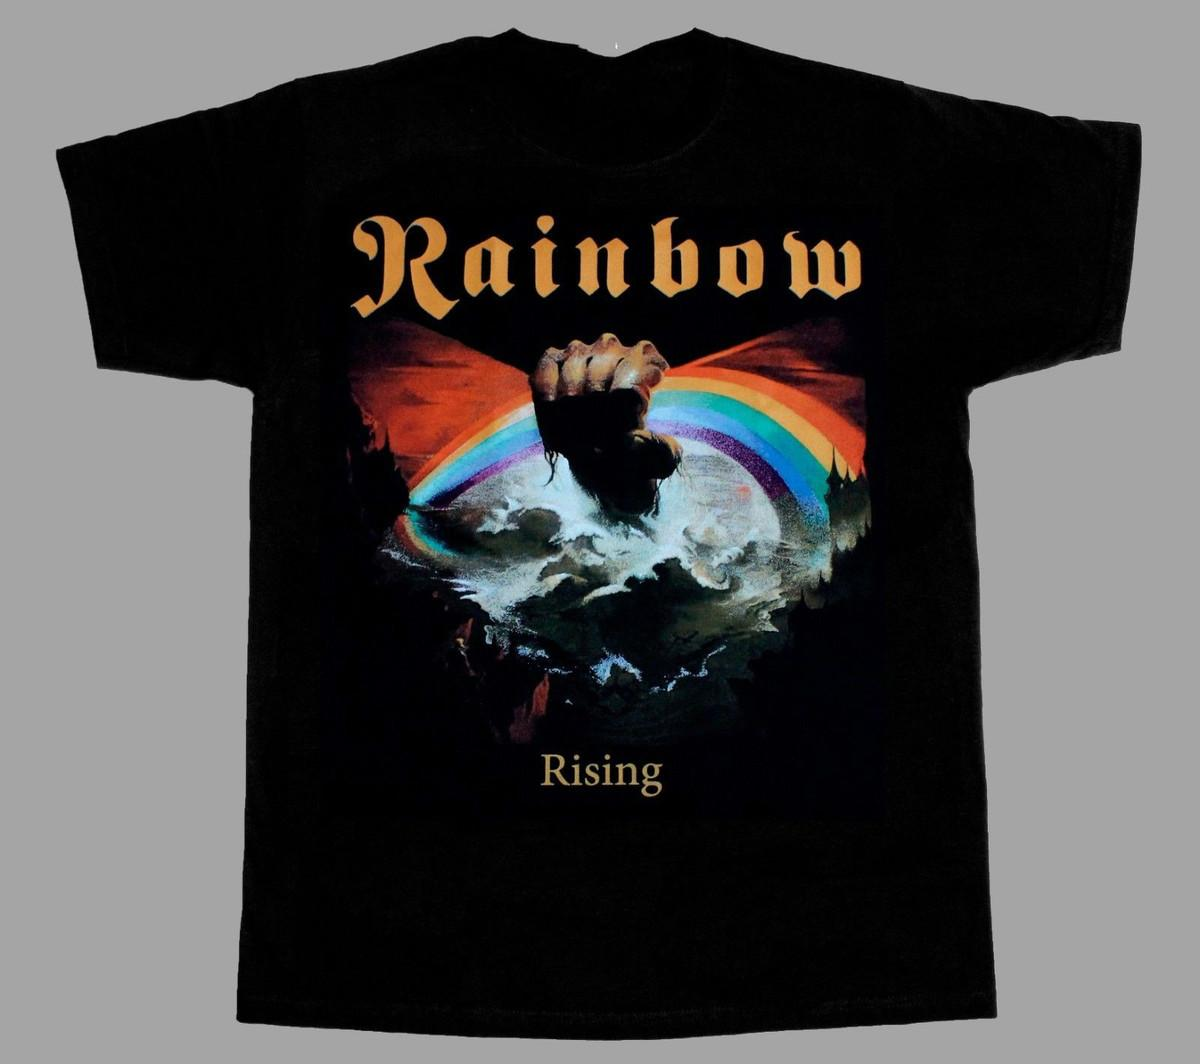 866532d4aaef RAINBOW RISING 76 BLACKMORE NEW BLACK SHORT LONG SLEEVE T SHIRT 3D T Shirt  Men Plus Size Cotton Tops Tee Homme High Quality Shirt Tee Shirt Shirts  From ...